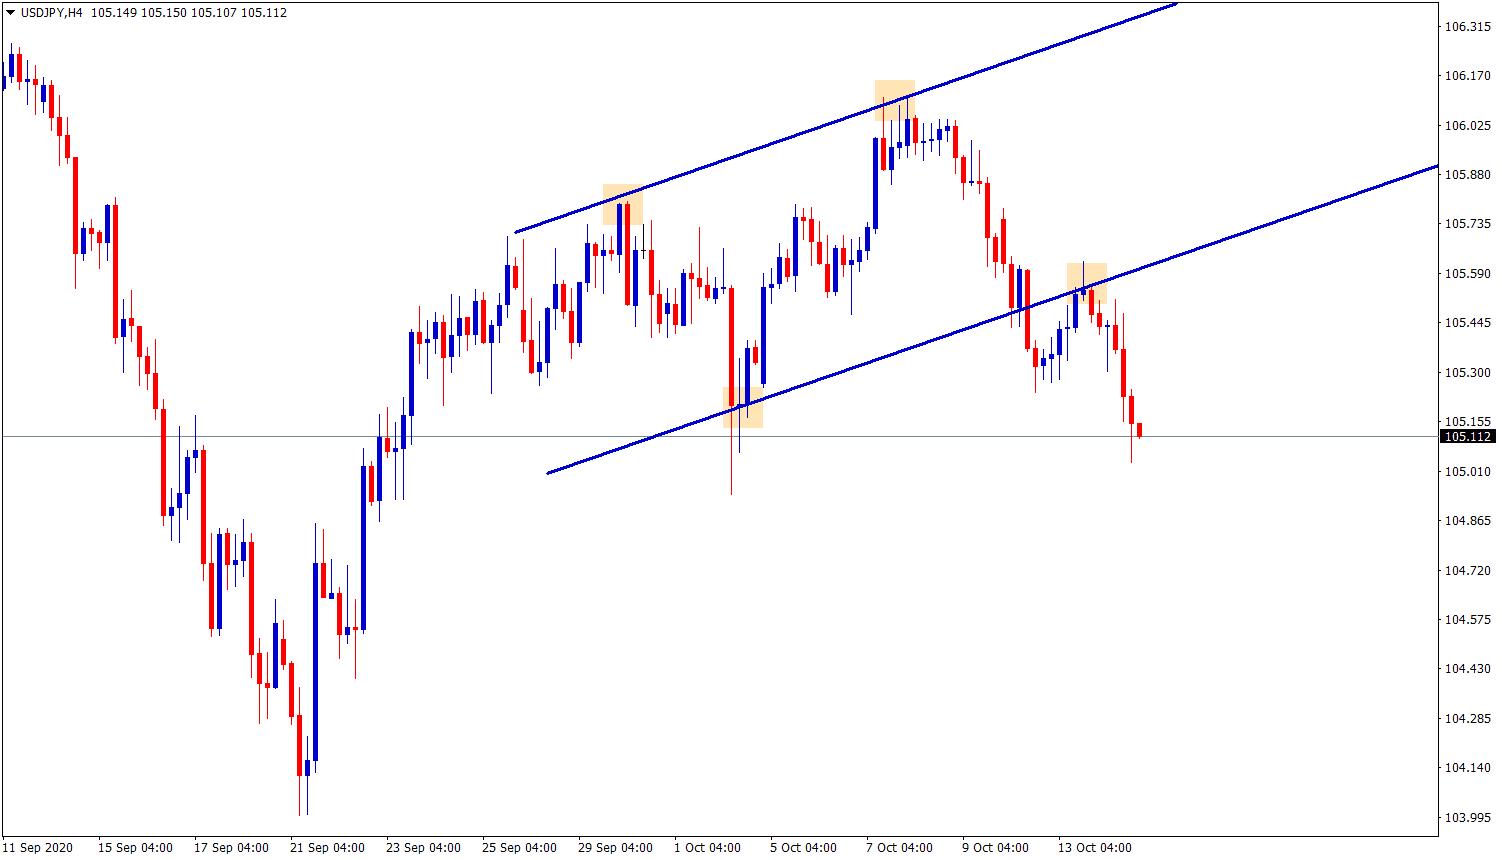 usdjpy broken and retested in ascending channel